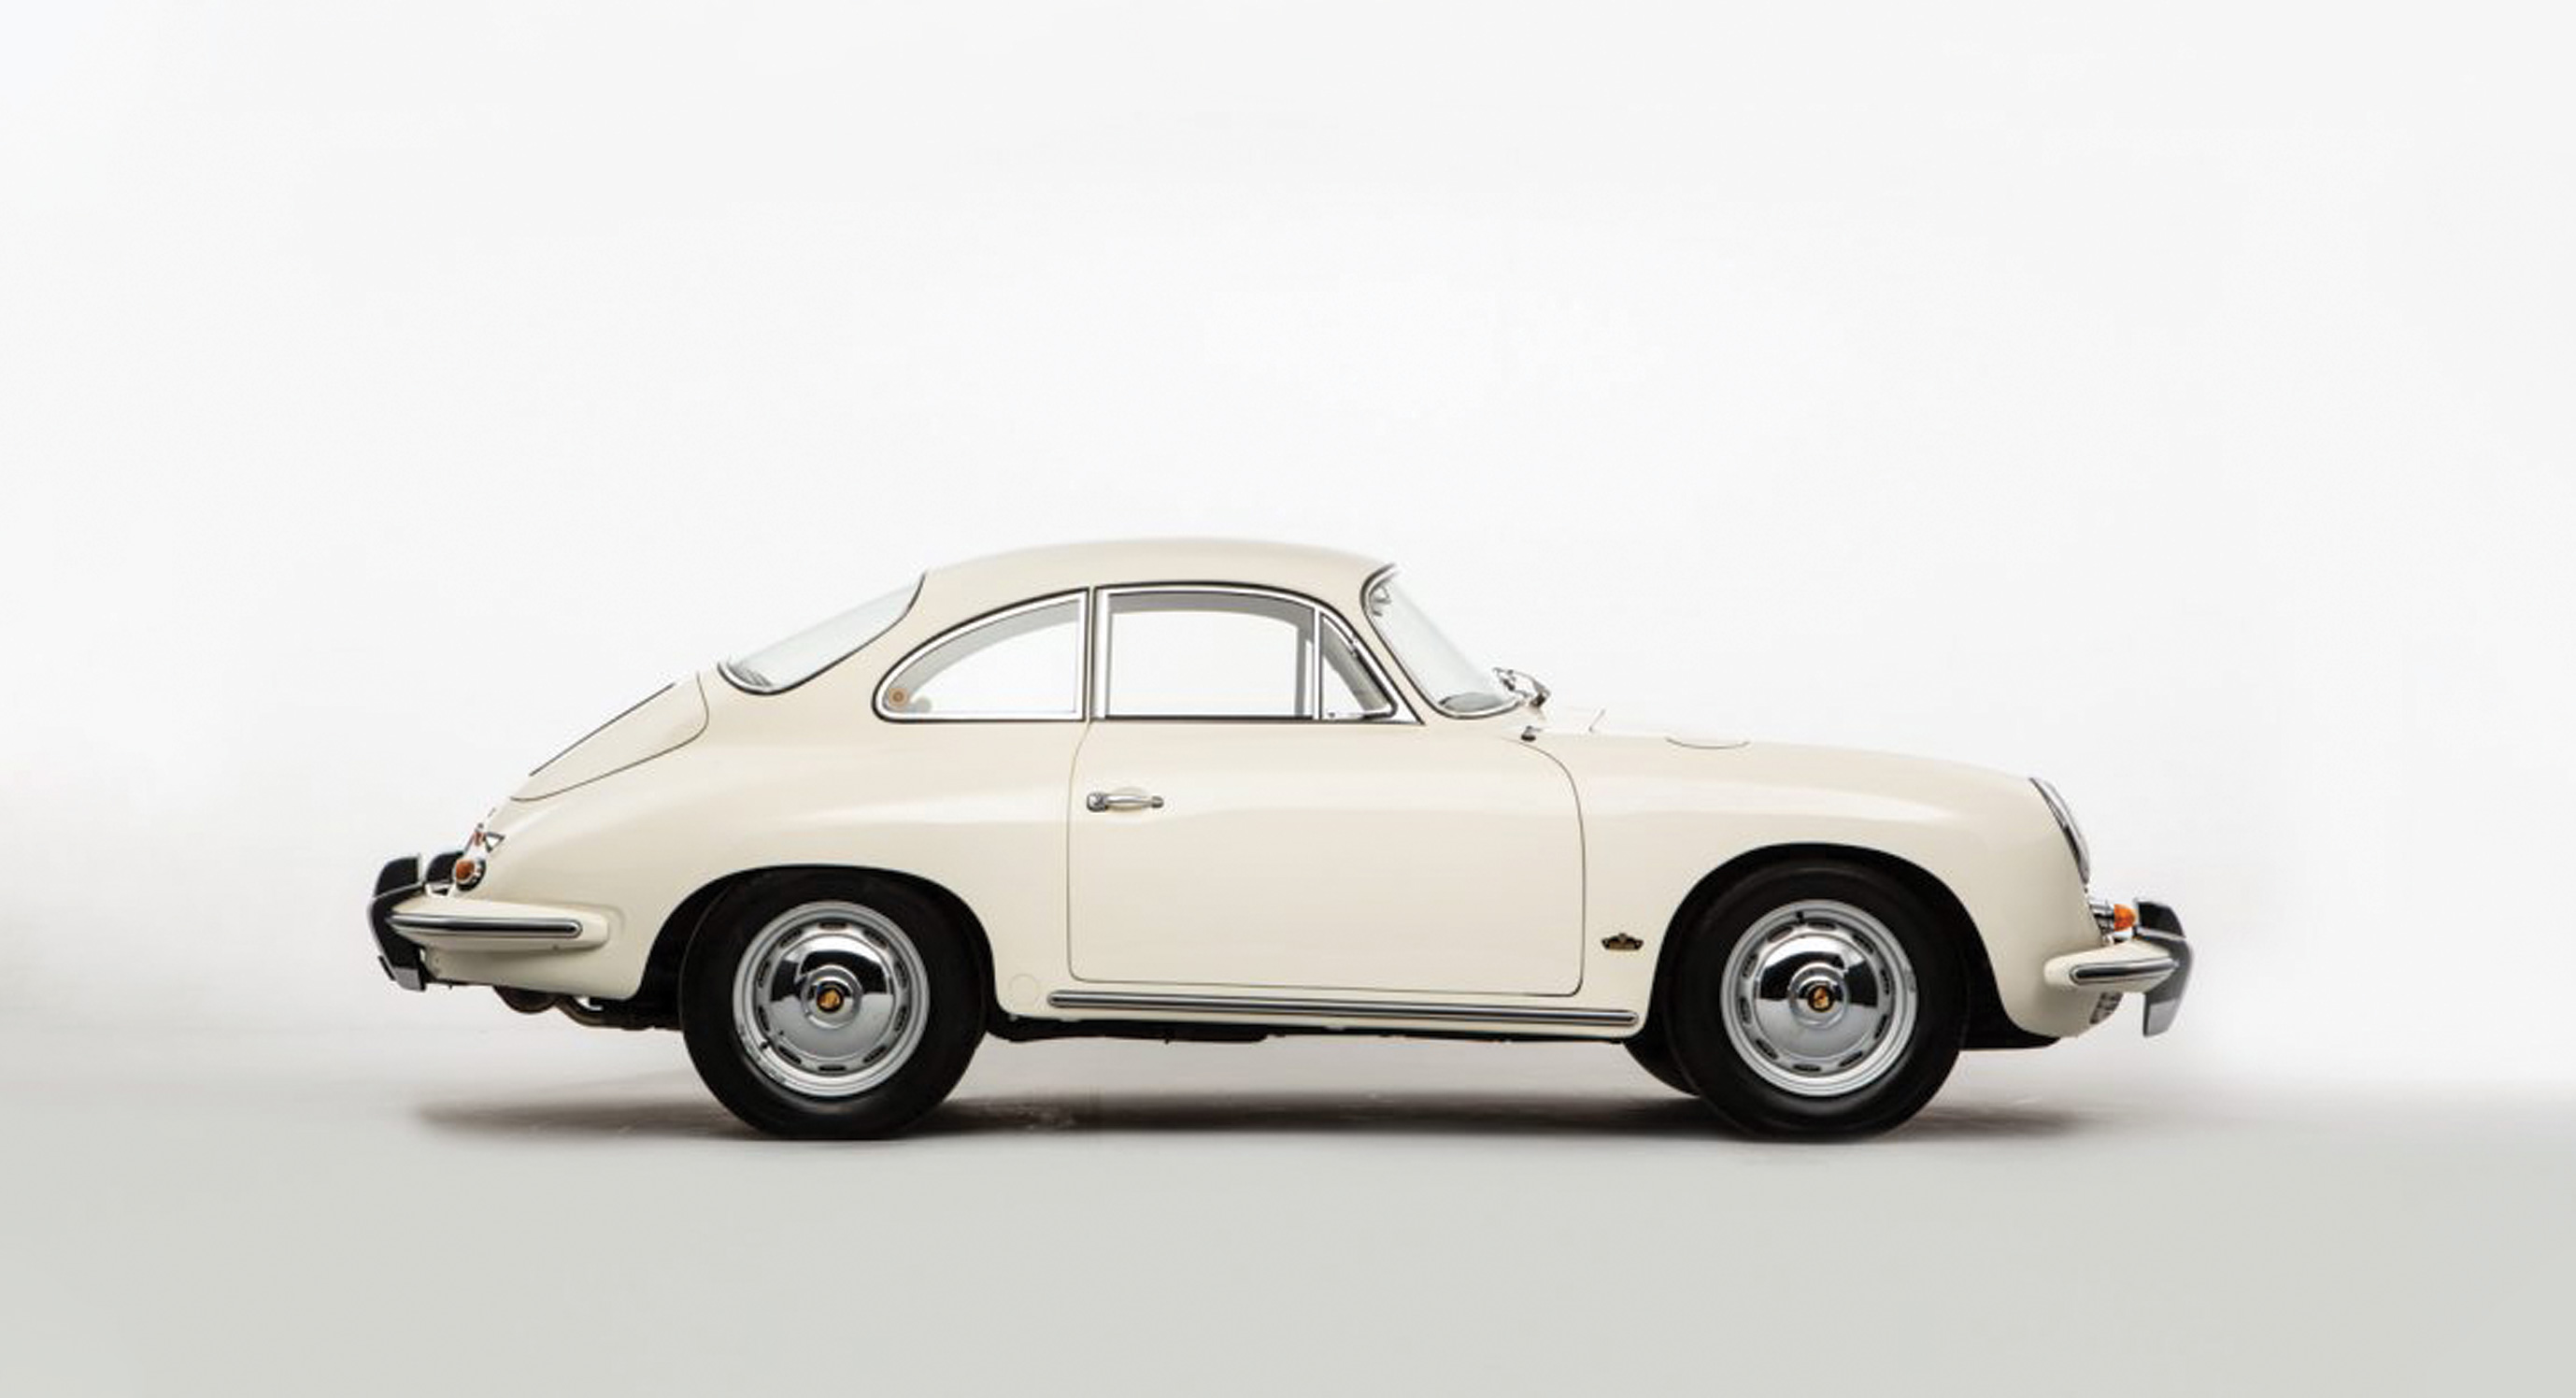 Classic Car Find of the Week: 1962 Porsche 356B 1600S